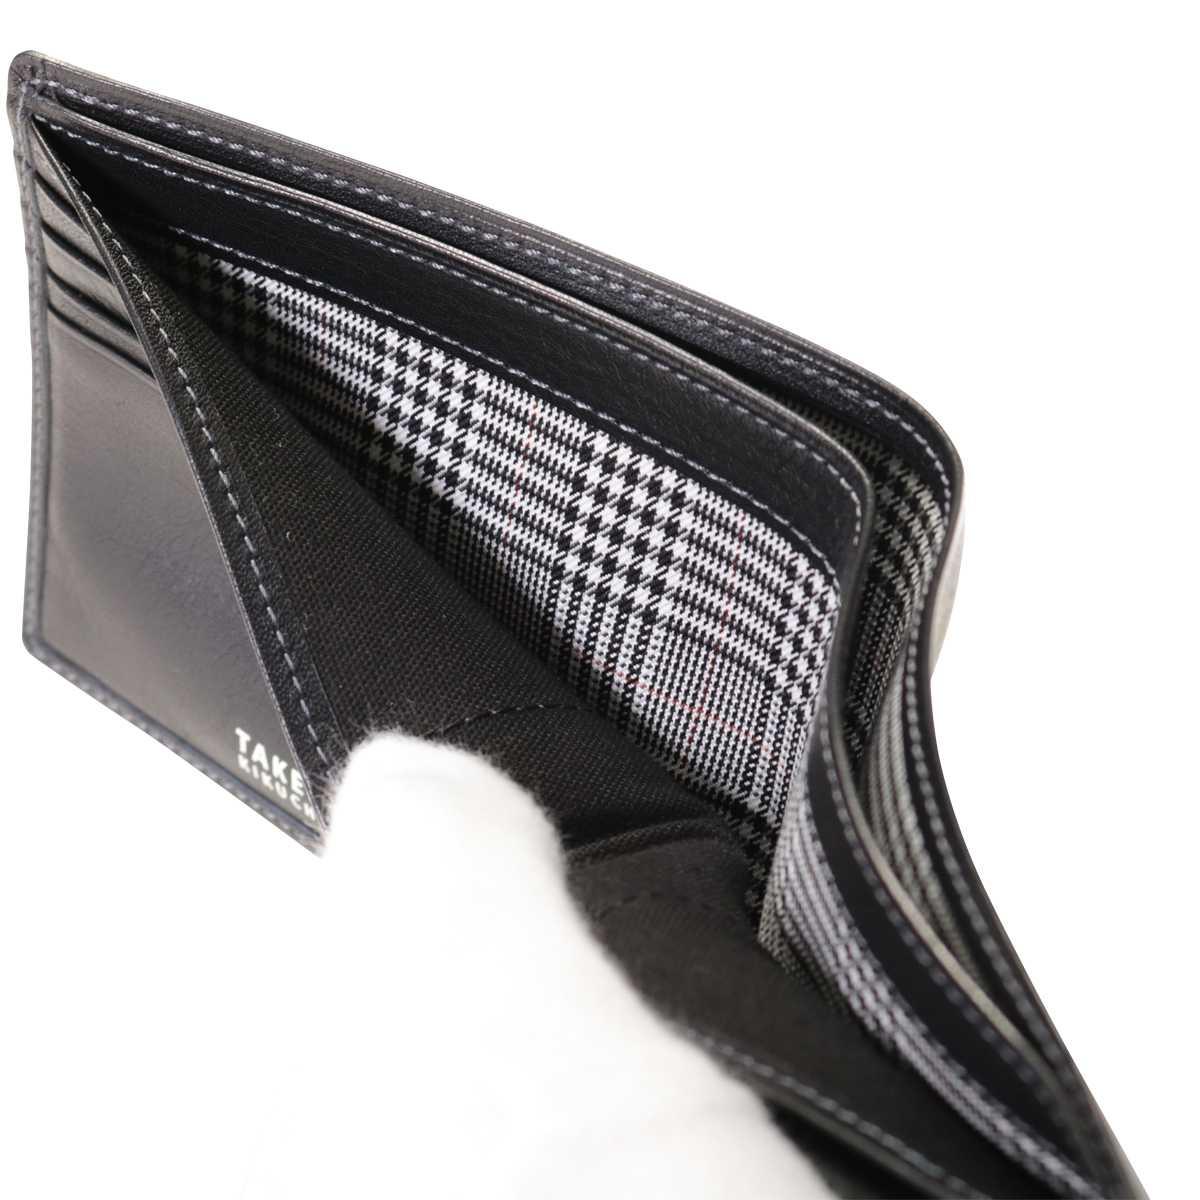 763dc2d13cb7e8 タケオキクチ 二つ折り財布 メンズ 日本製 オイルヌメ 6150118 TAKEO ...